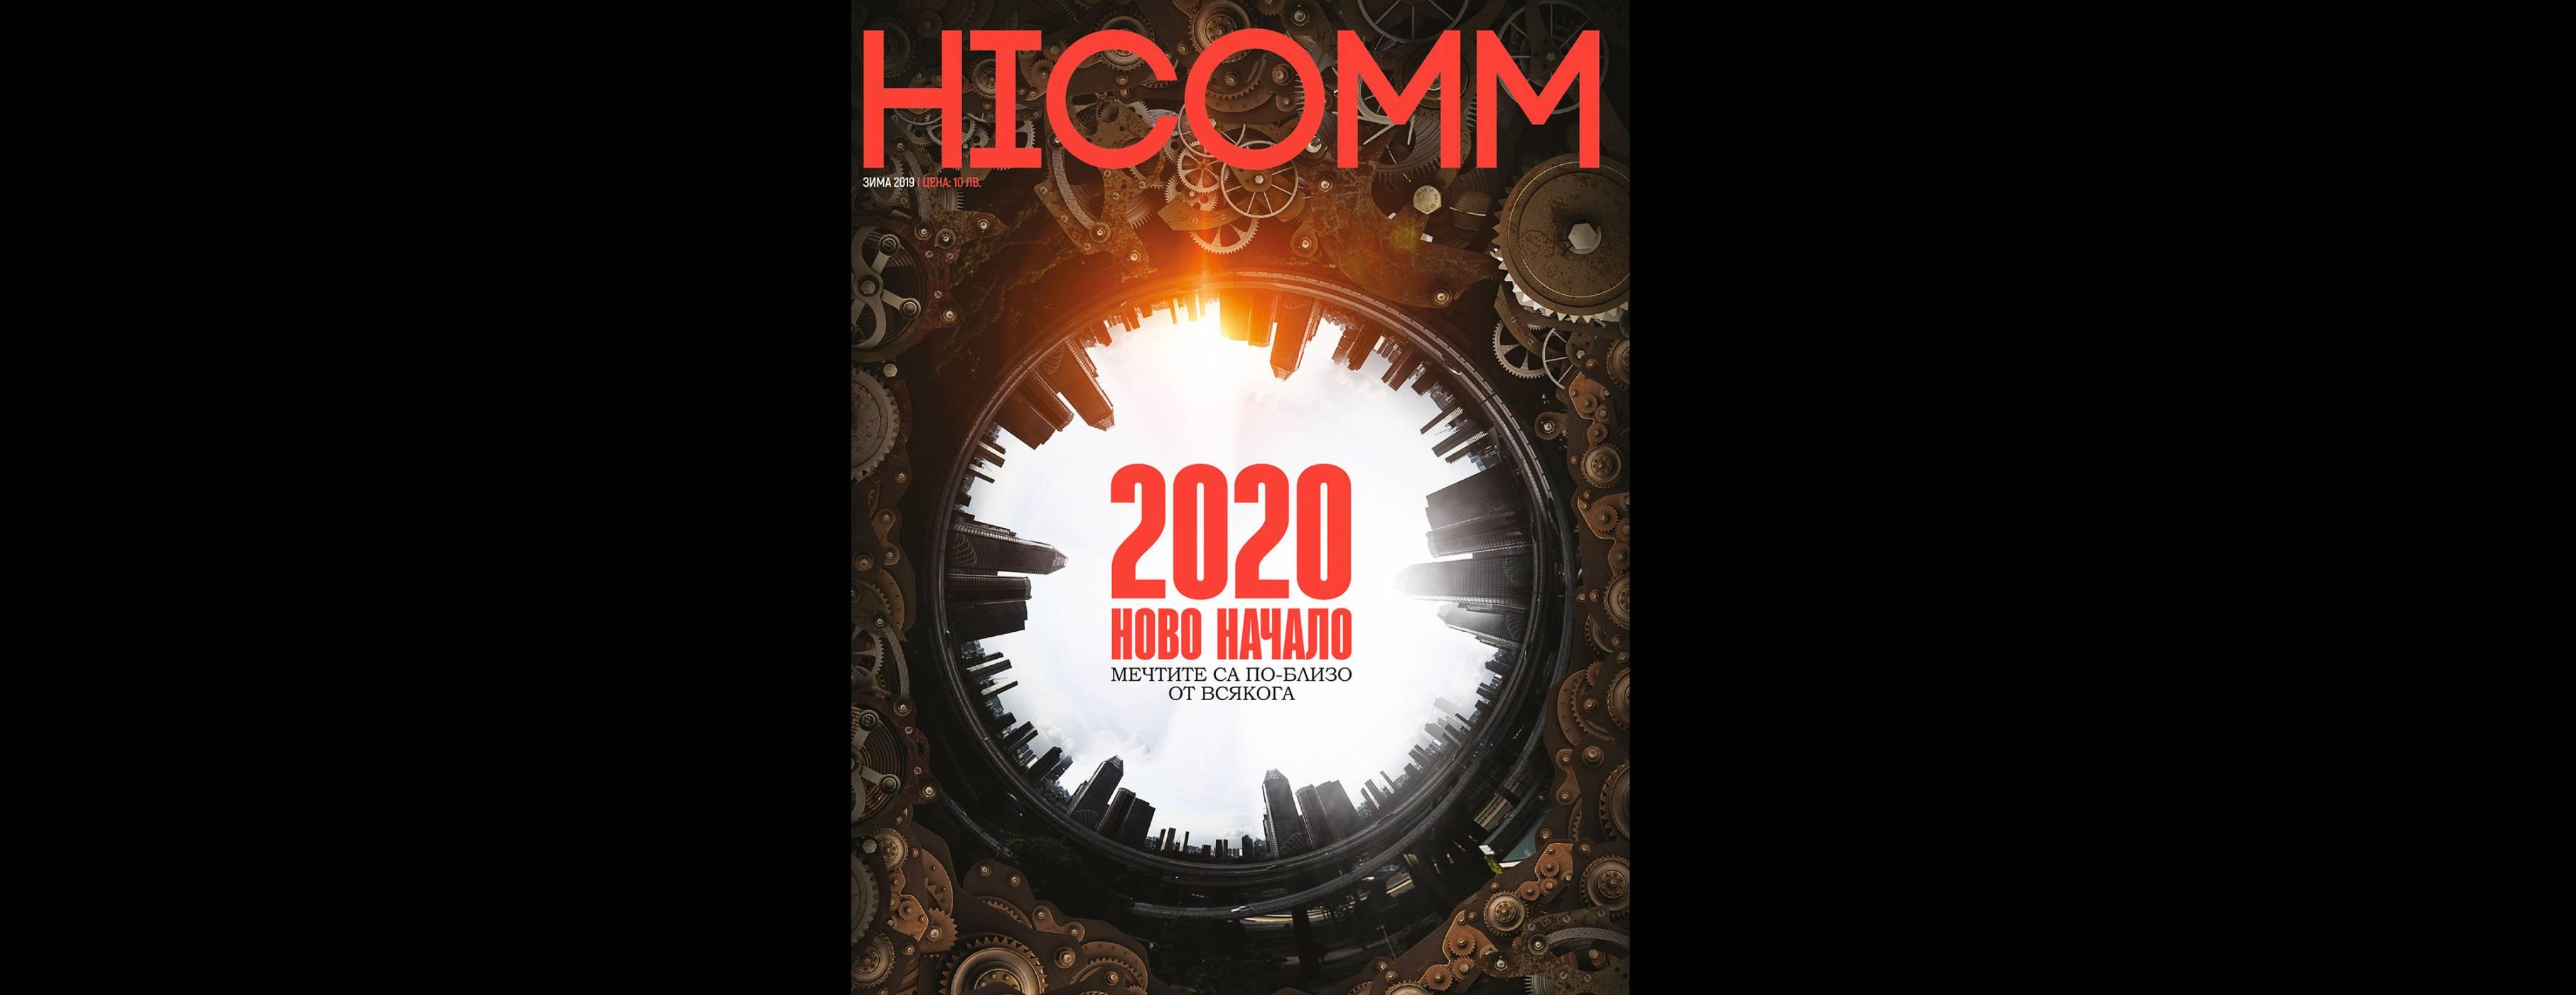 HiComm брой 214 (зима) е вече на пазара - докоснете на живо неговите 192 страници!